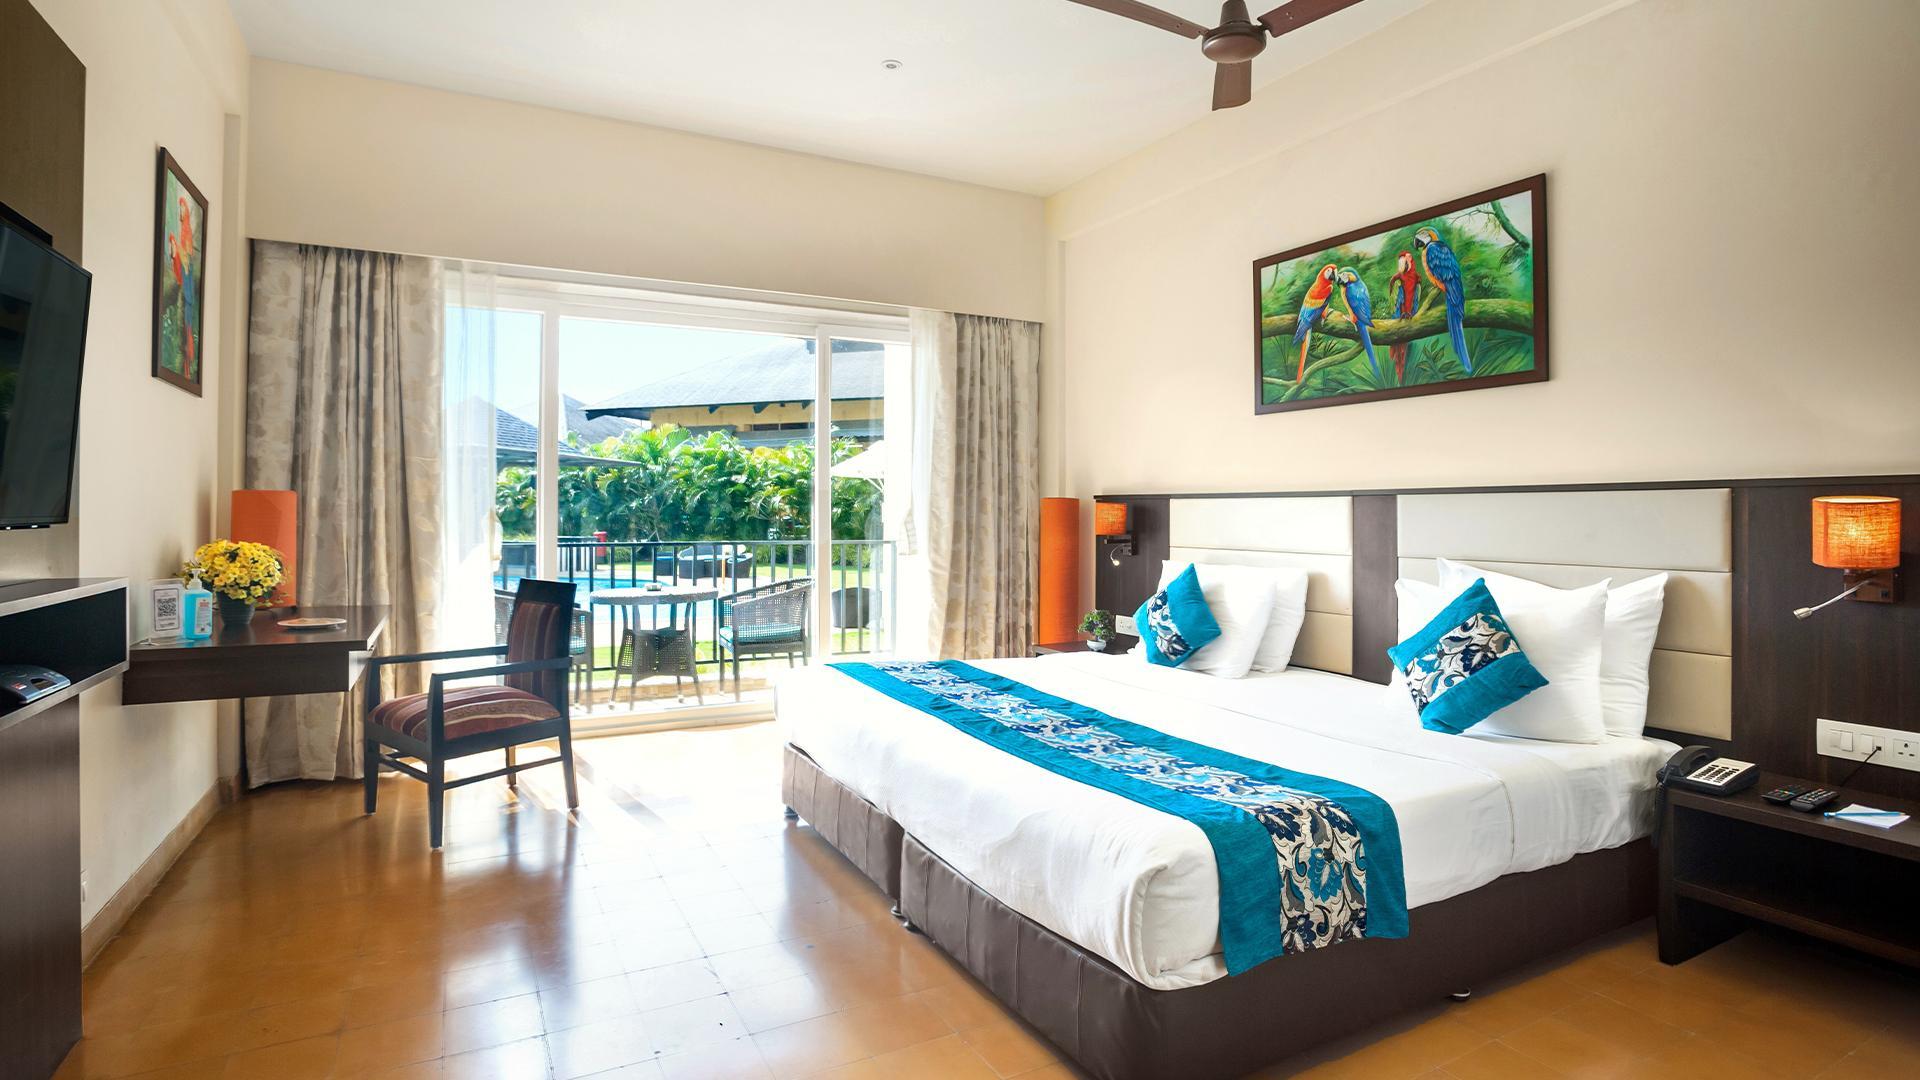 Magnolia Room image 1 at Tropical Retreat Luxury Resort & Spa by Nashik, Maharashtra, India